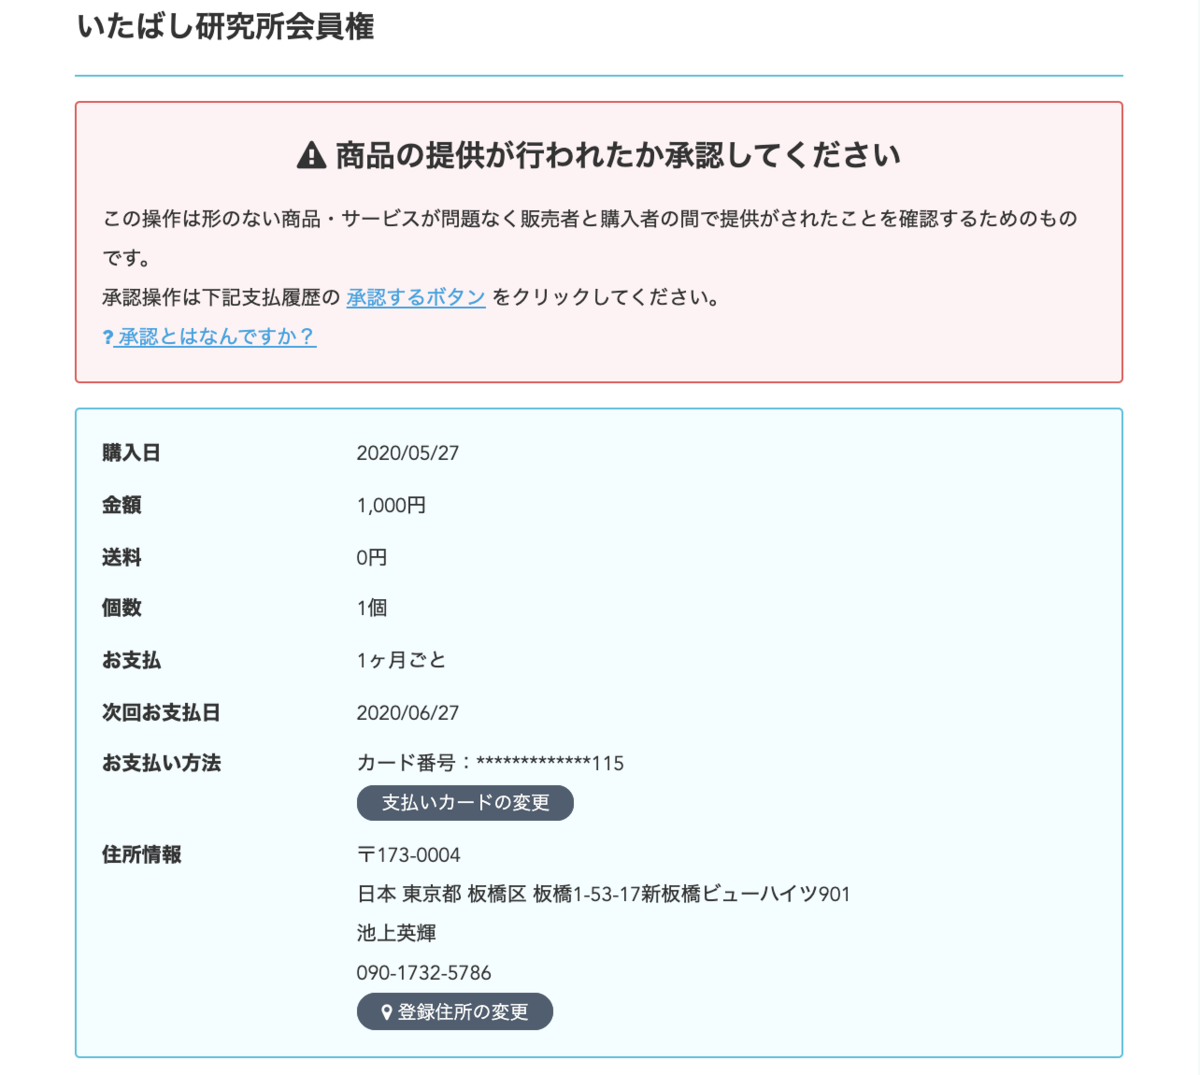 f:id:senberohoppy:20200528100030p:plain